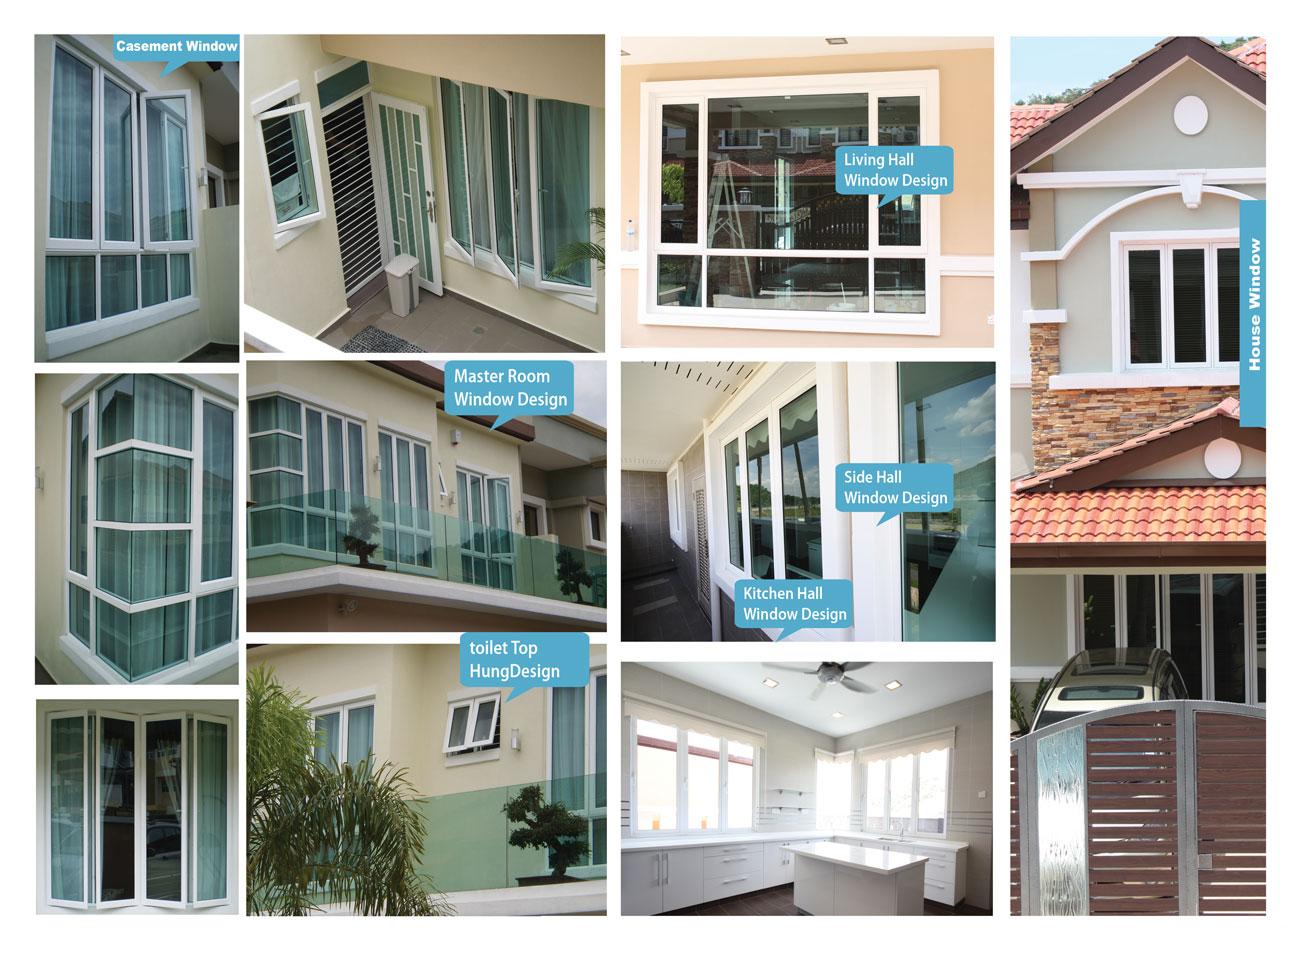 8. Choosing The Wrong Windows